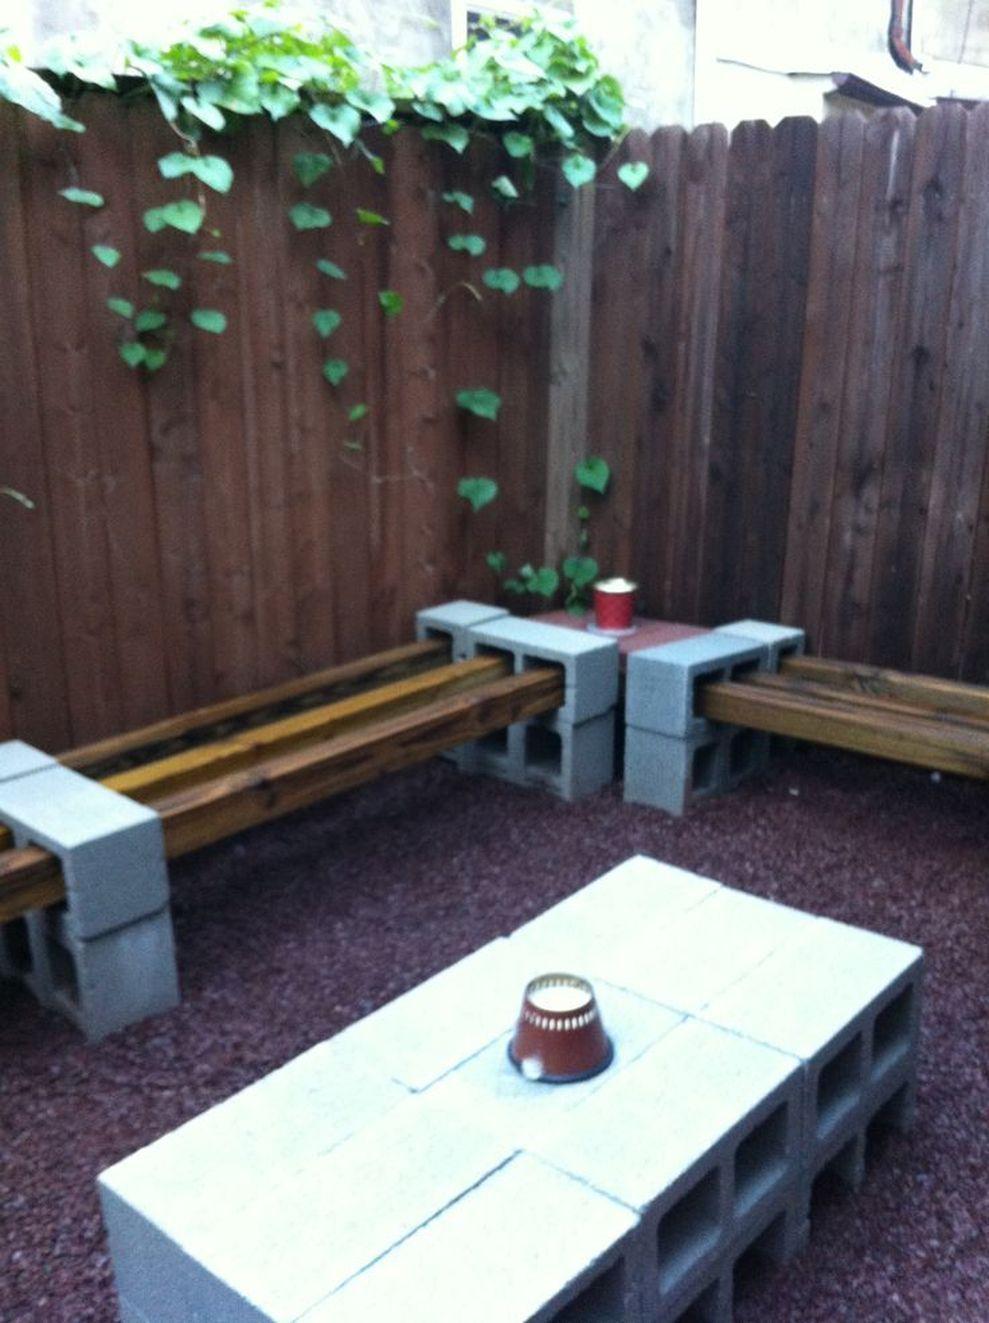 63 Cinder Block Furniture Backyard Roundecor Cinder Block Furniture Cinder Block Garden Wall Cheap Patio Furniture